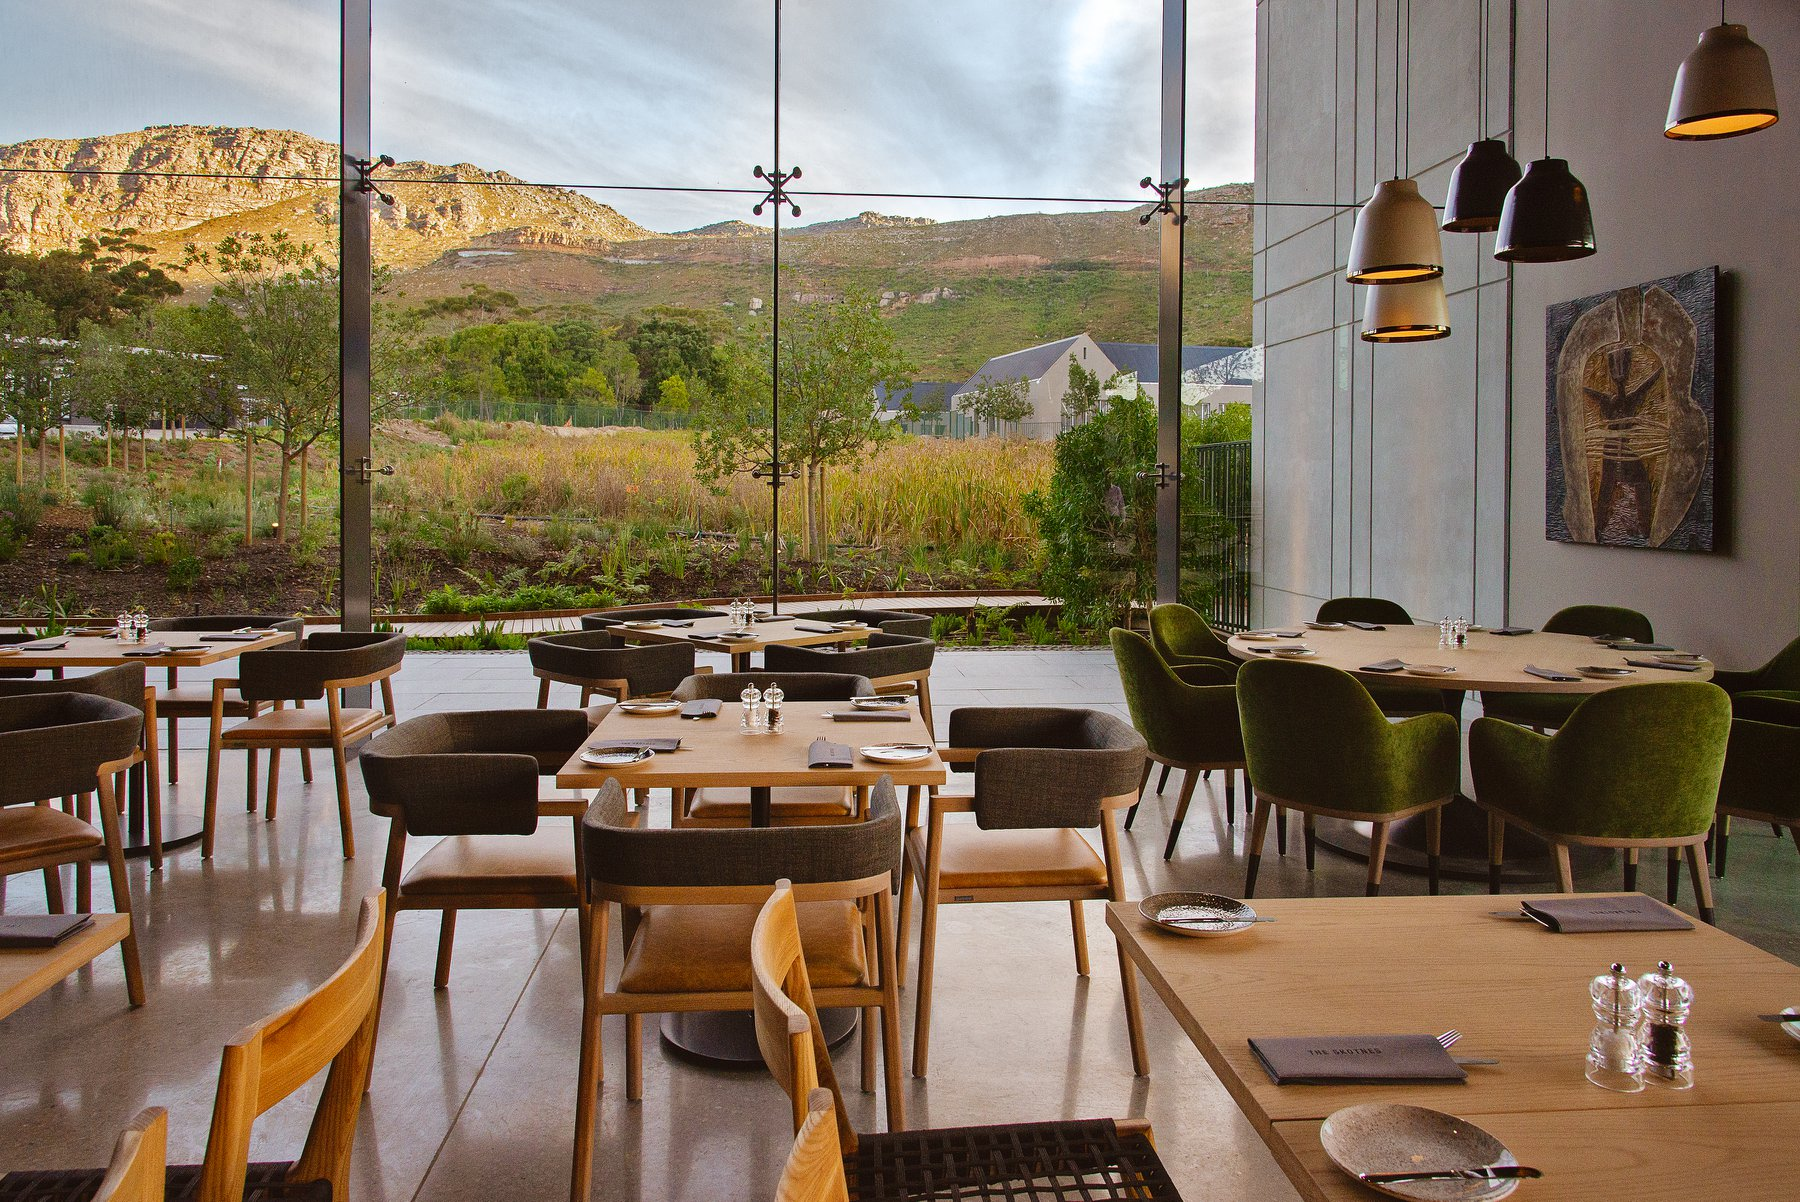 The Skotnes Restaurant